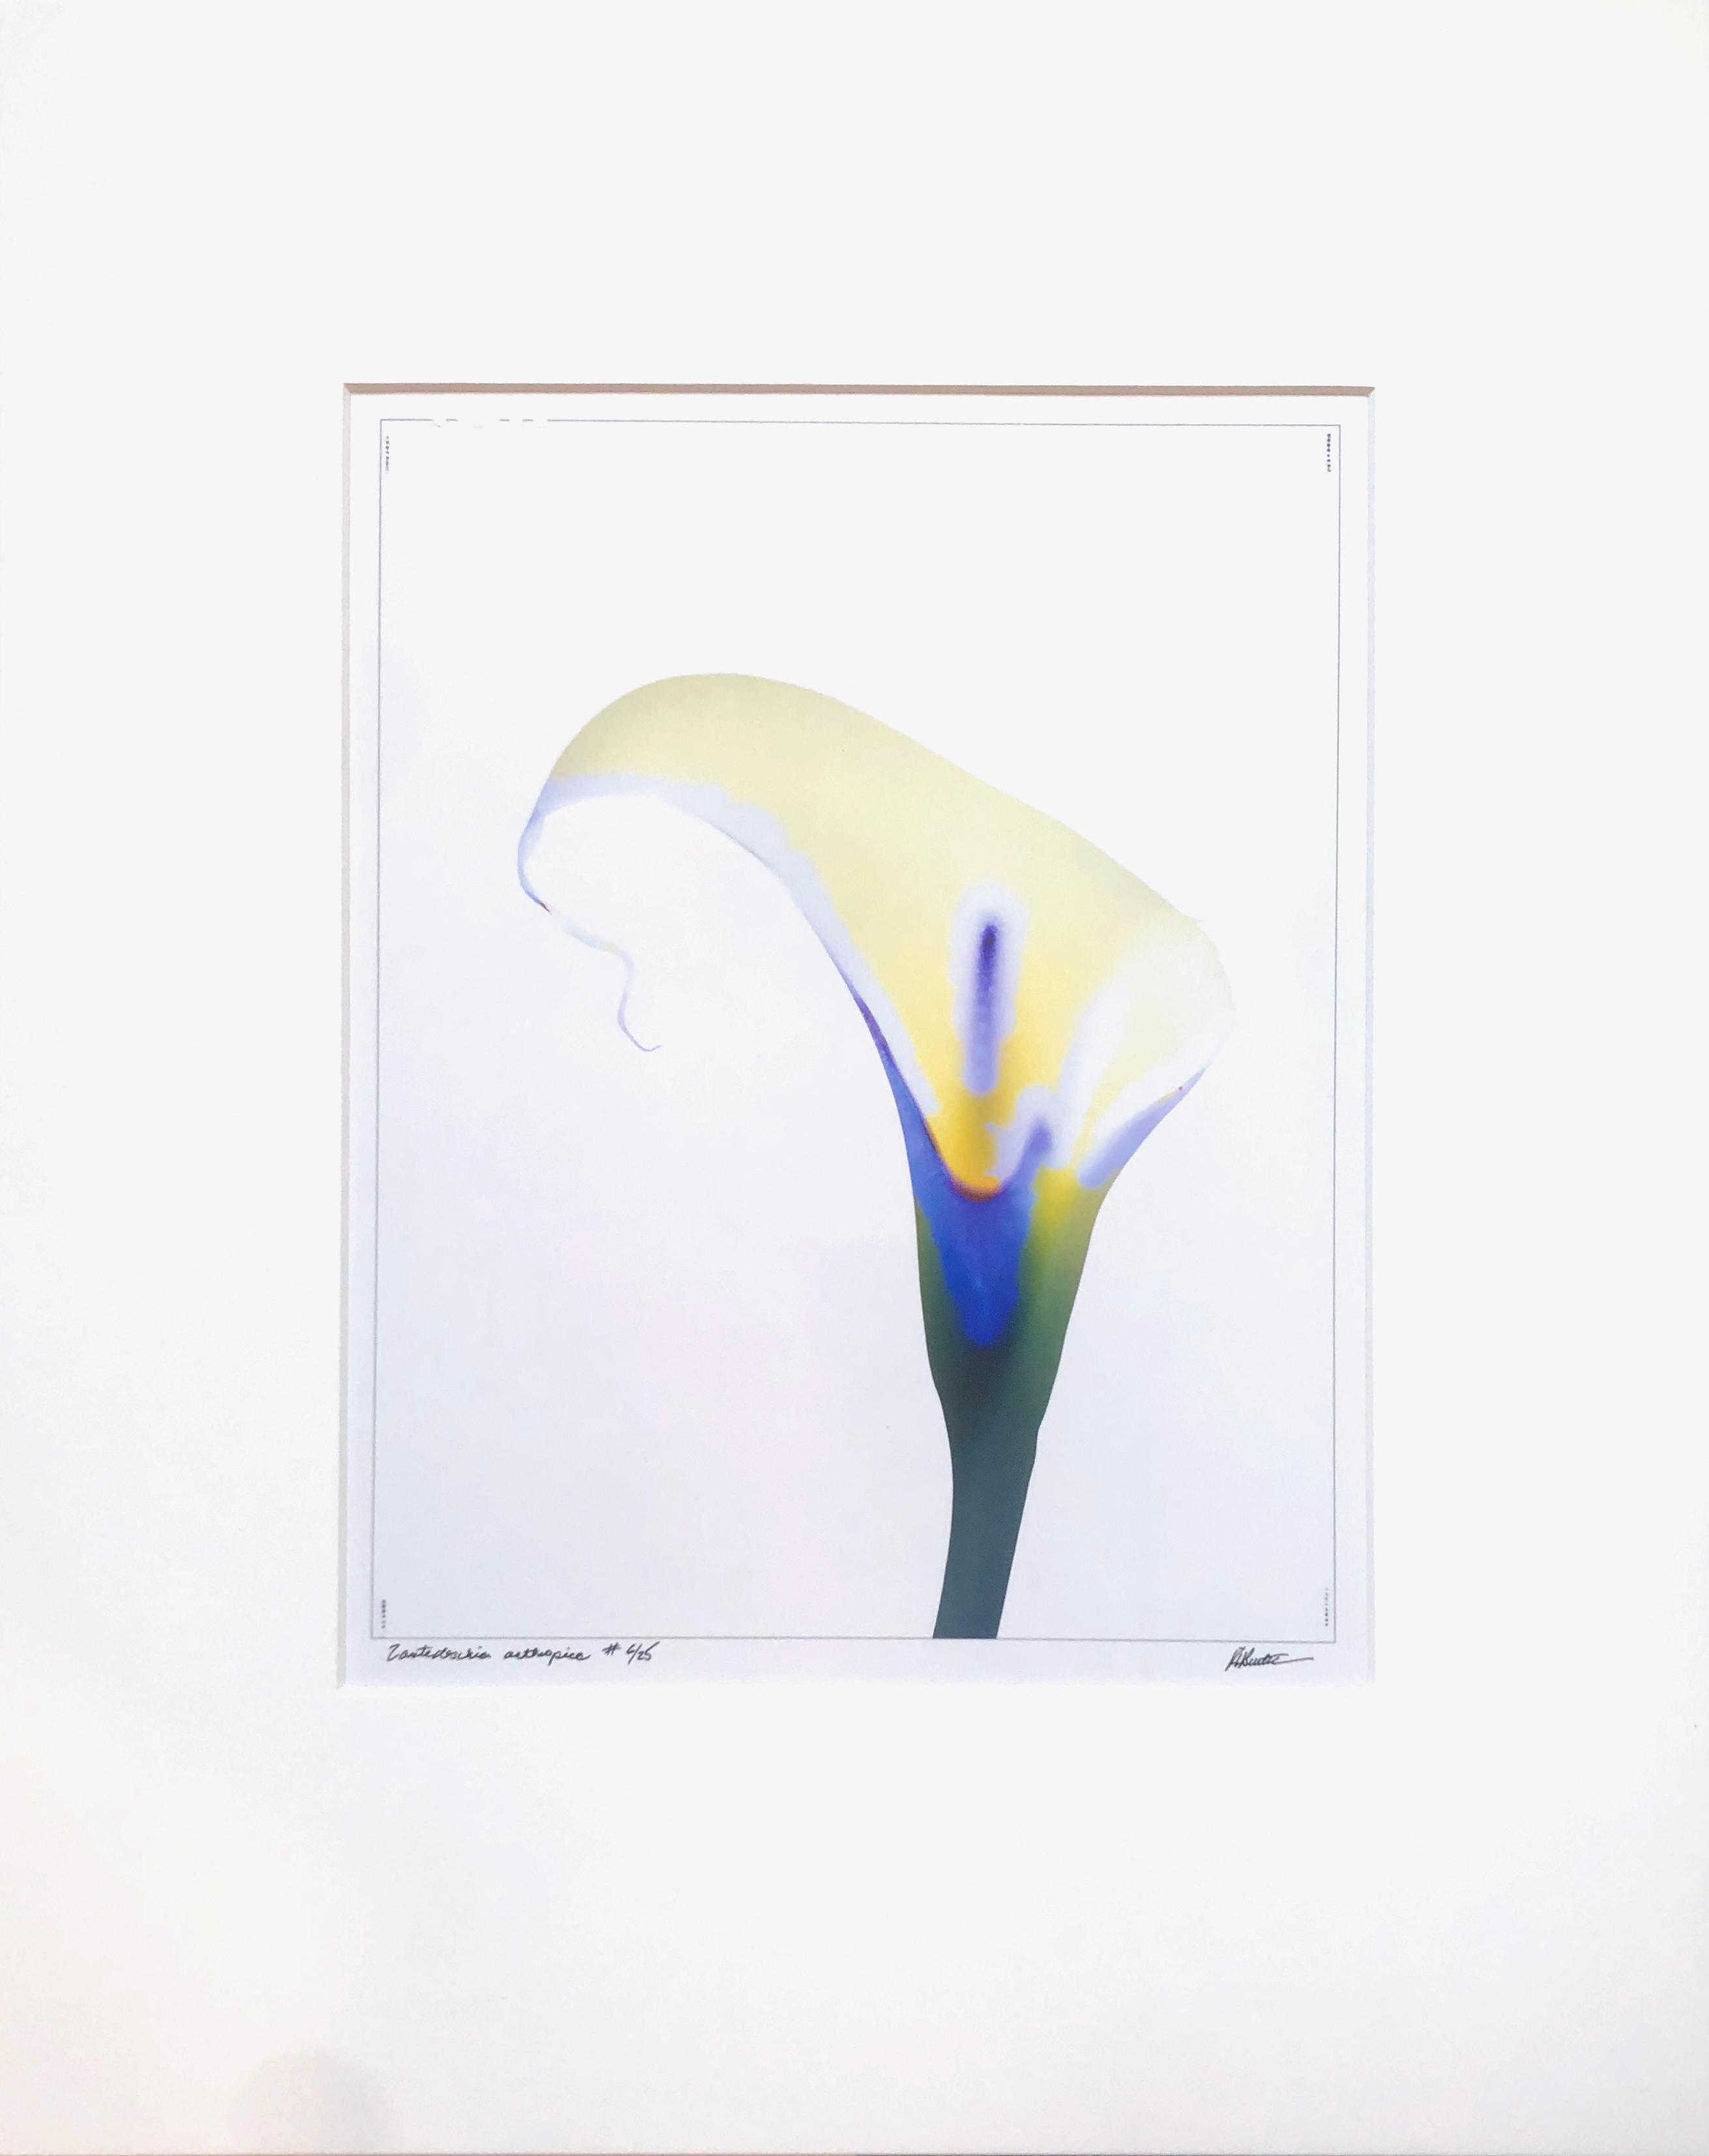 """Zantedeschia aethiopica"" by Robert Buelteman, Cameraless photograph print, 2000"